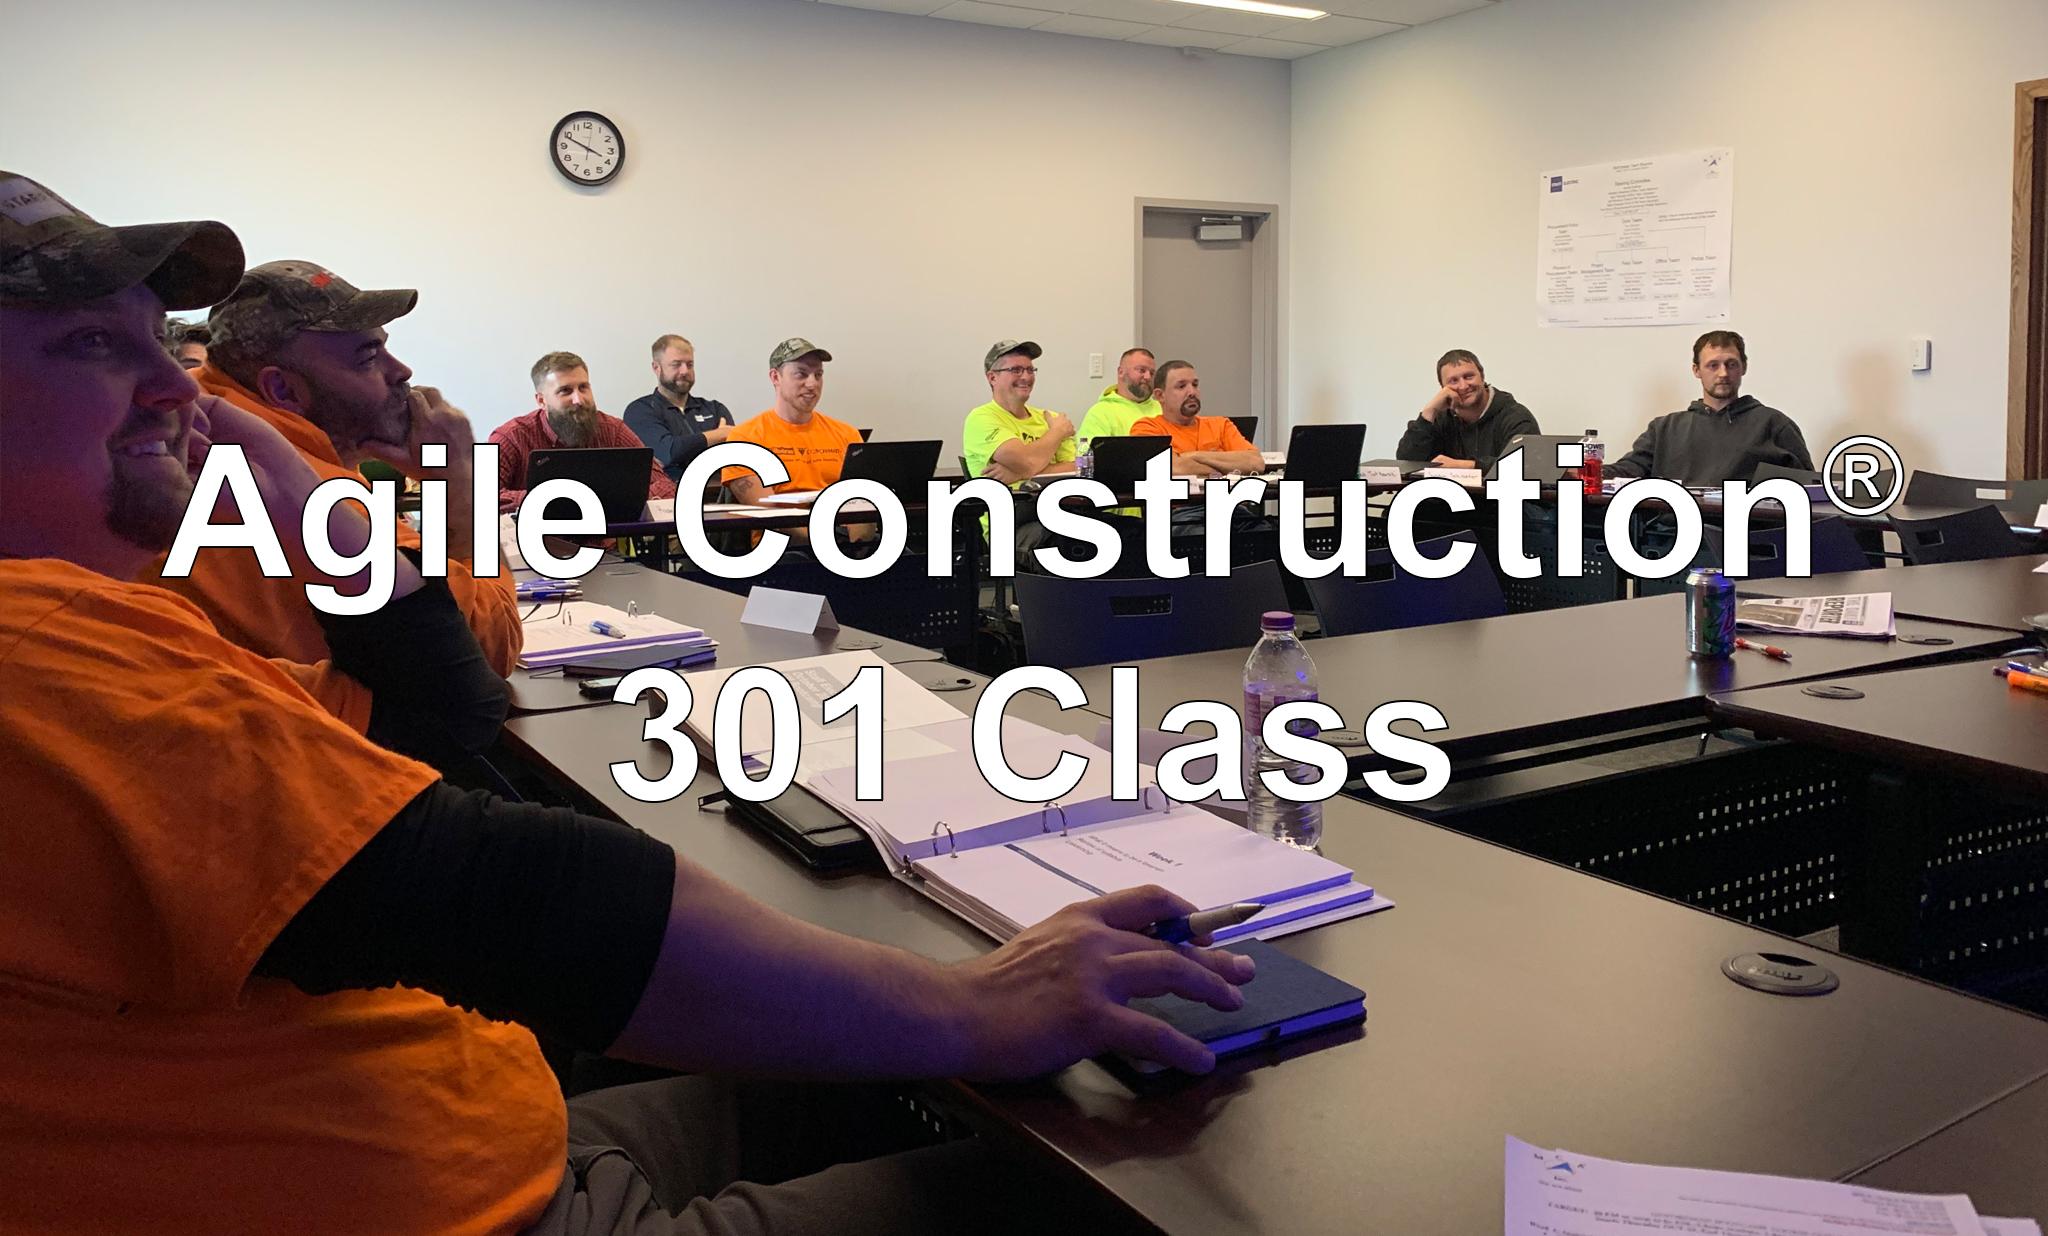 Agile Construction 301 Graphic